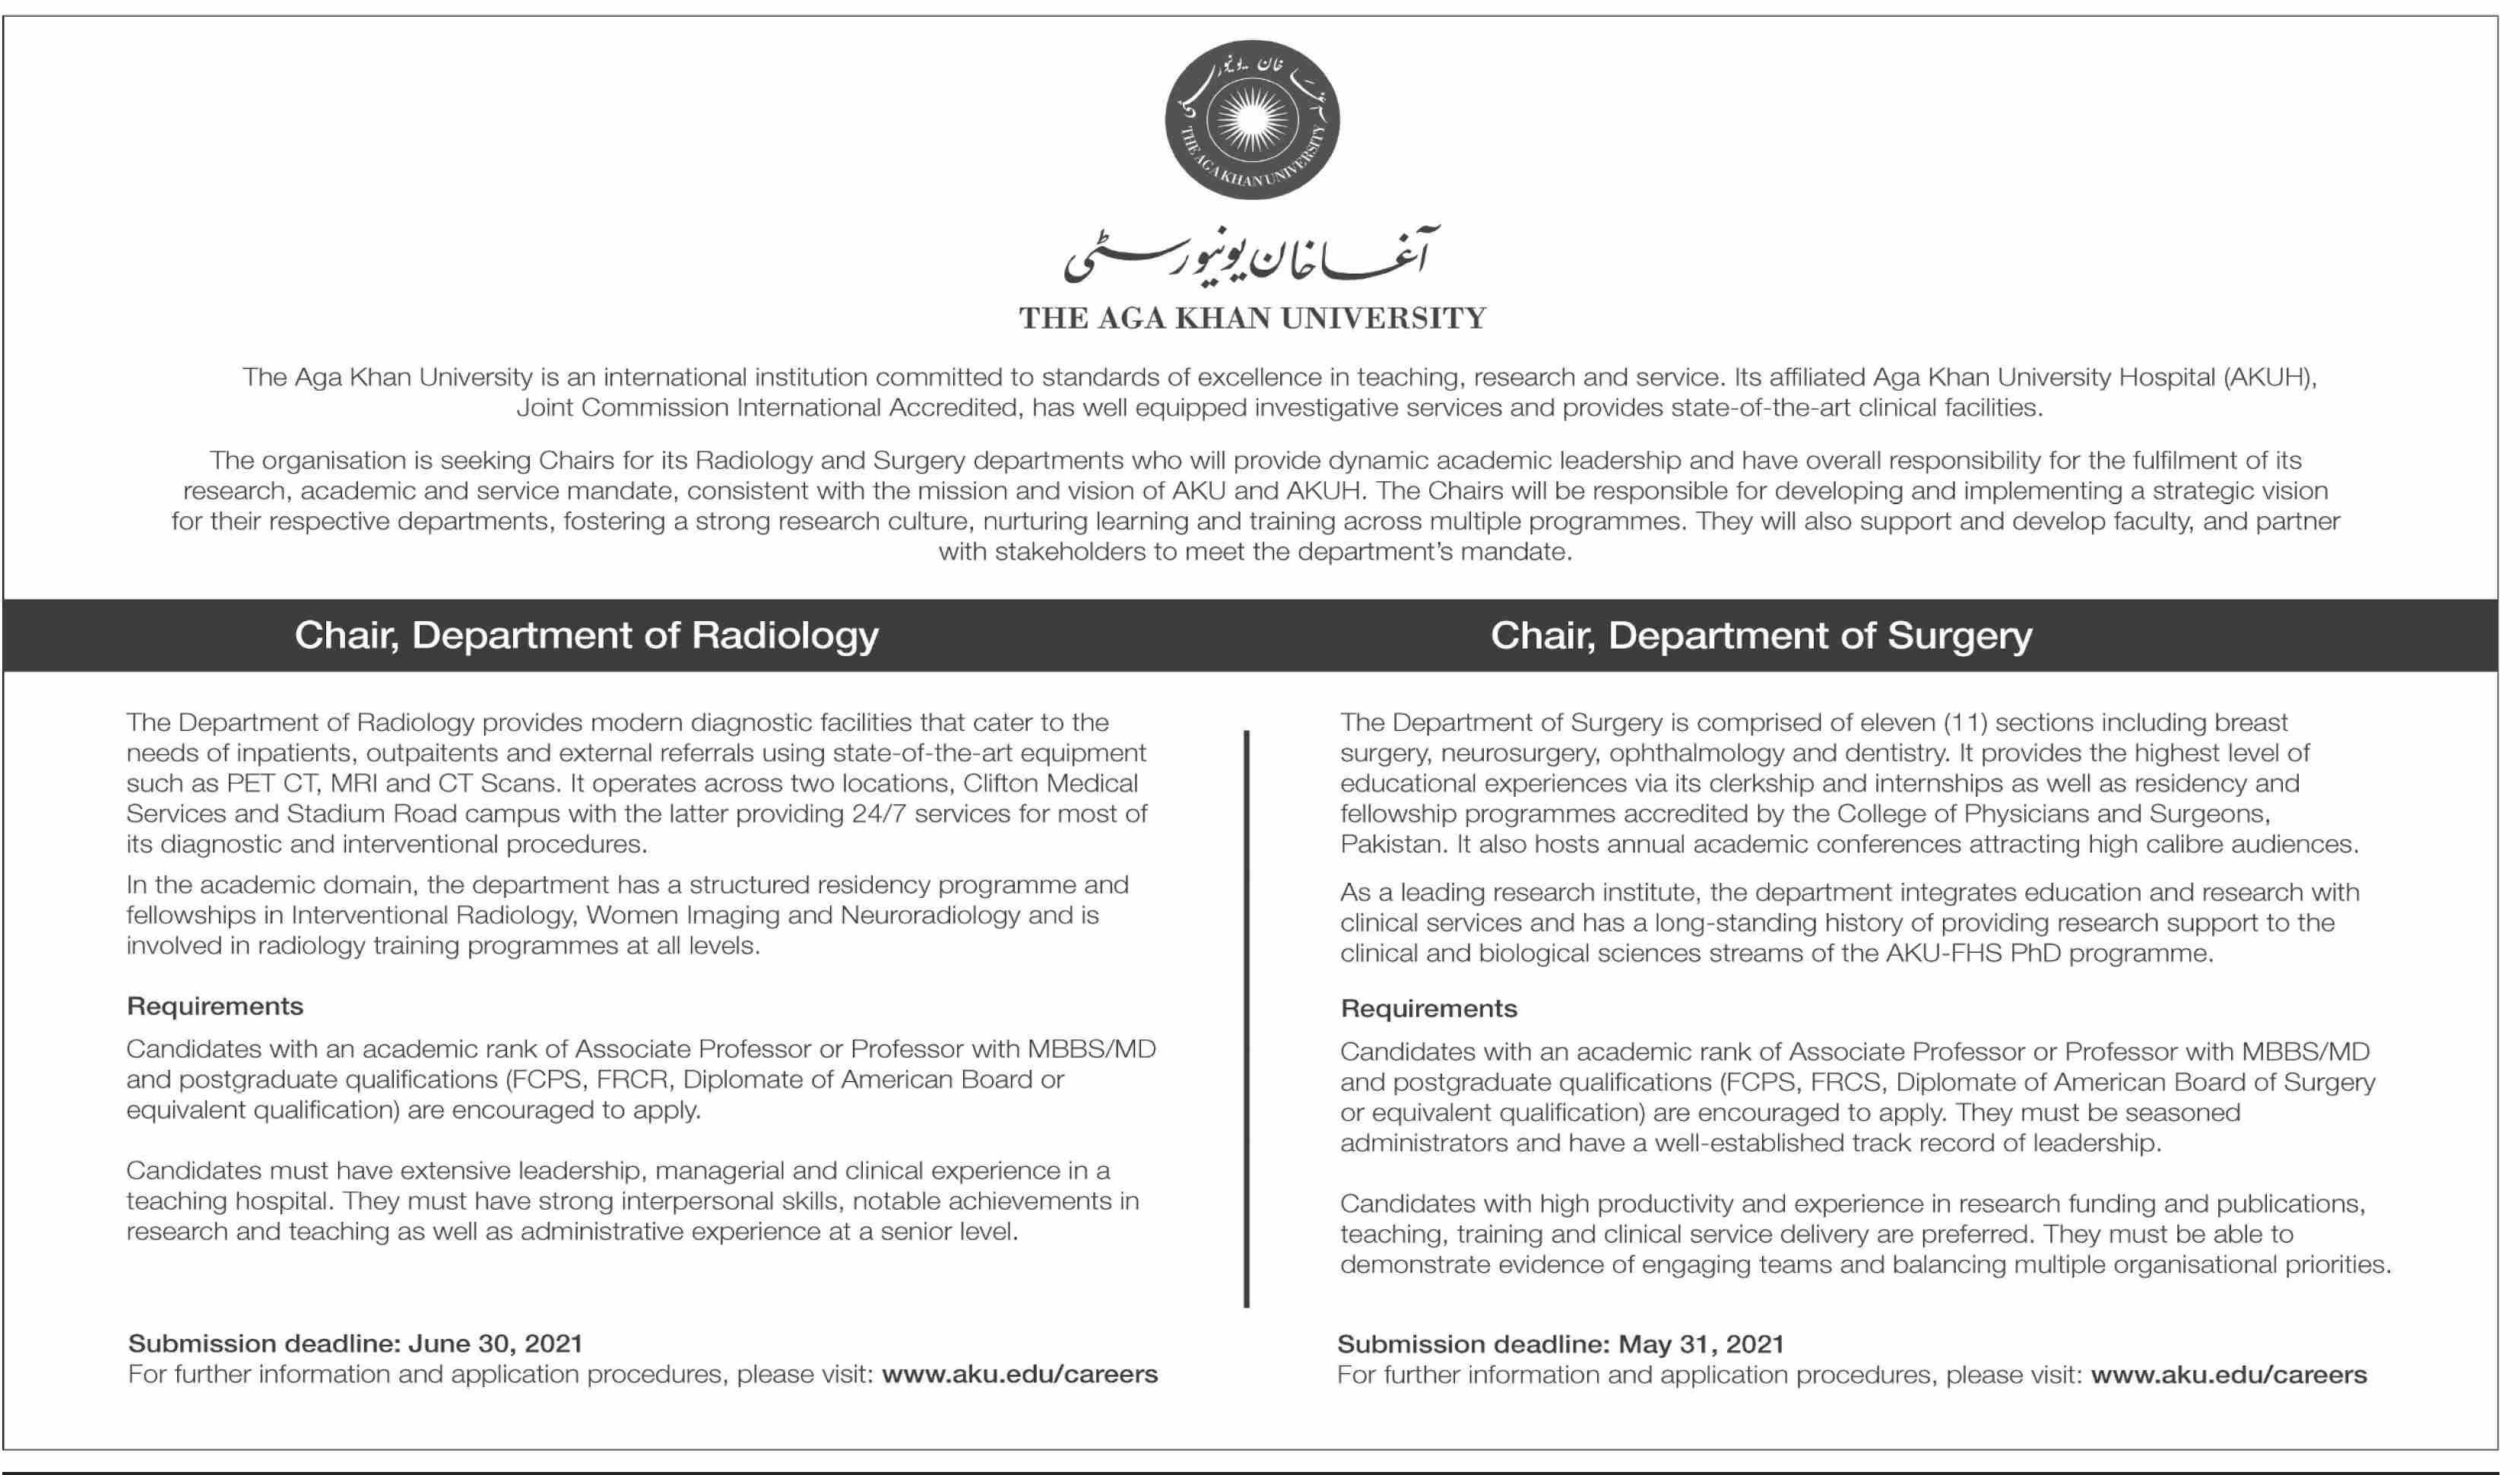 The Aga Khan University Jobs 2021 in Karachi